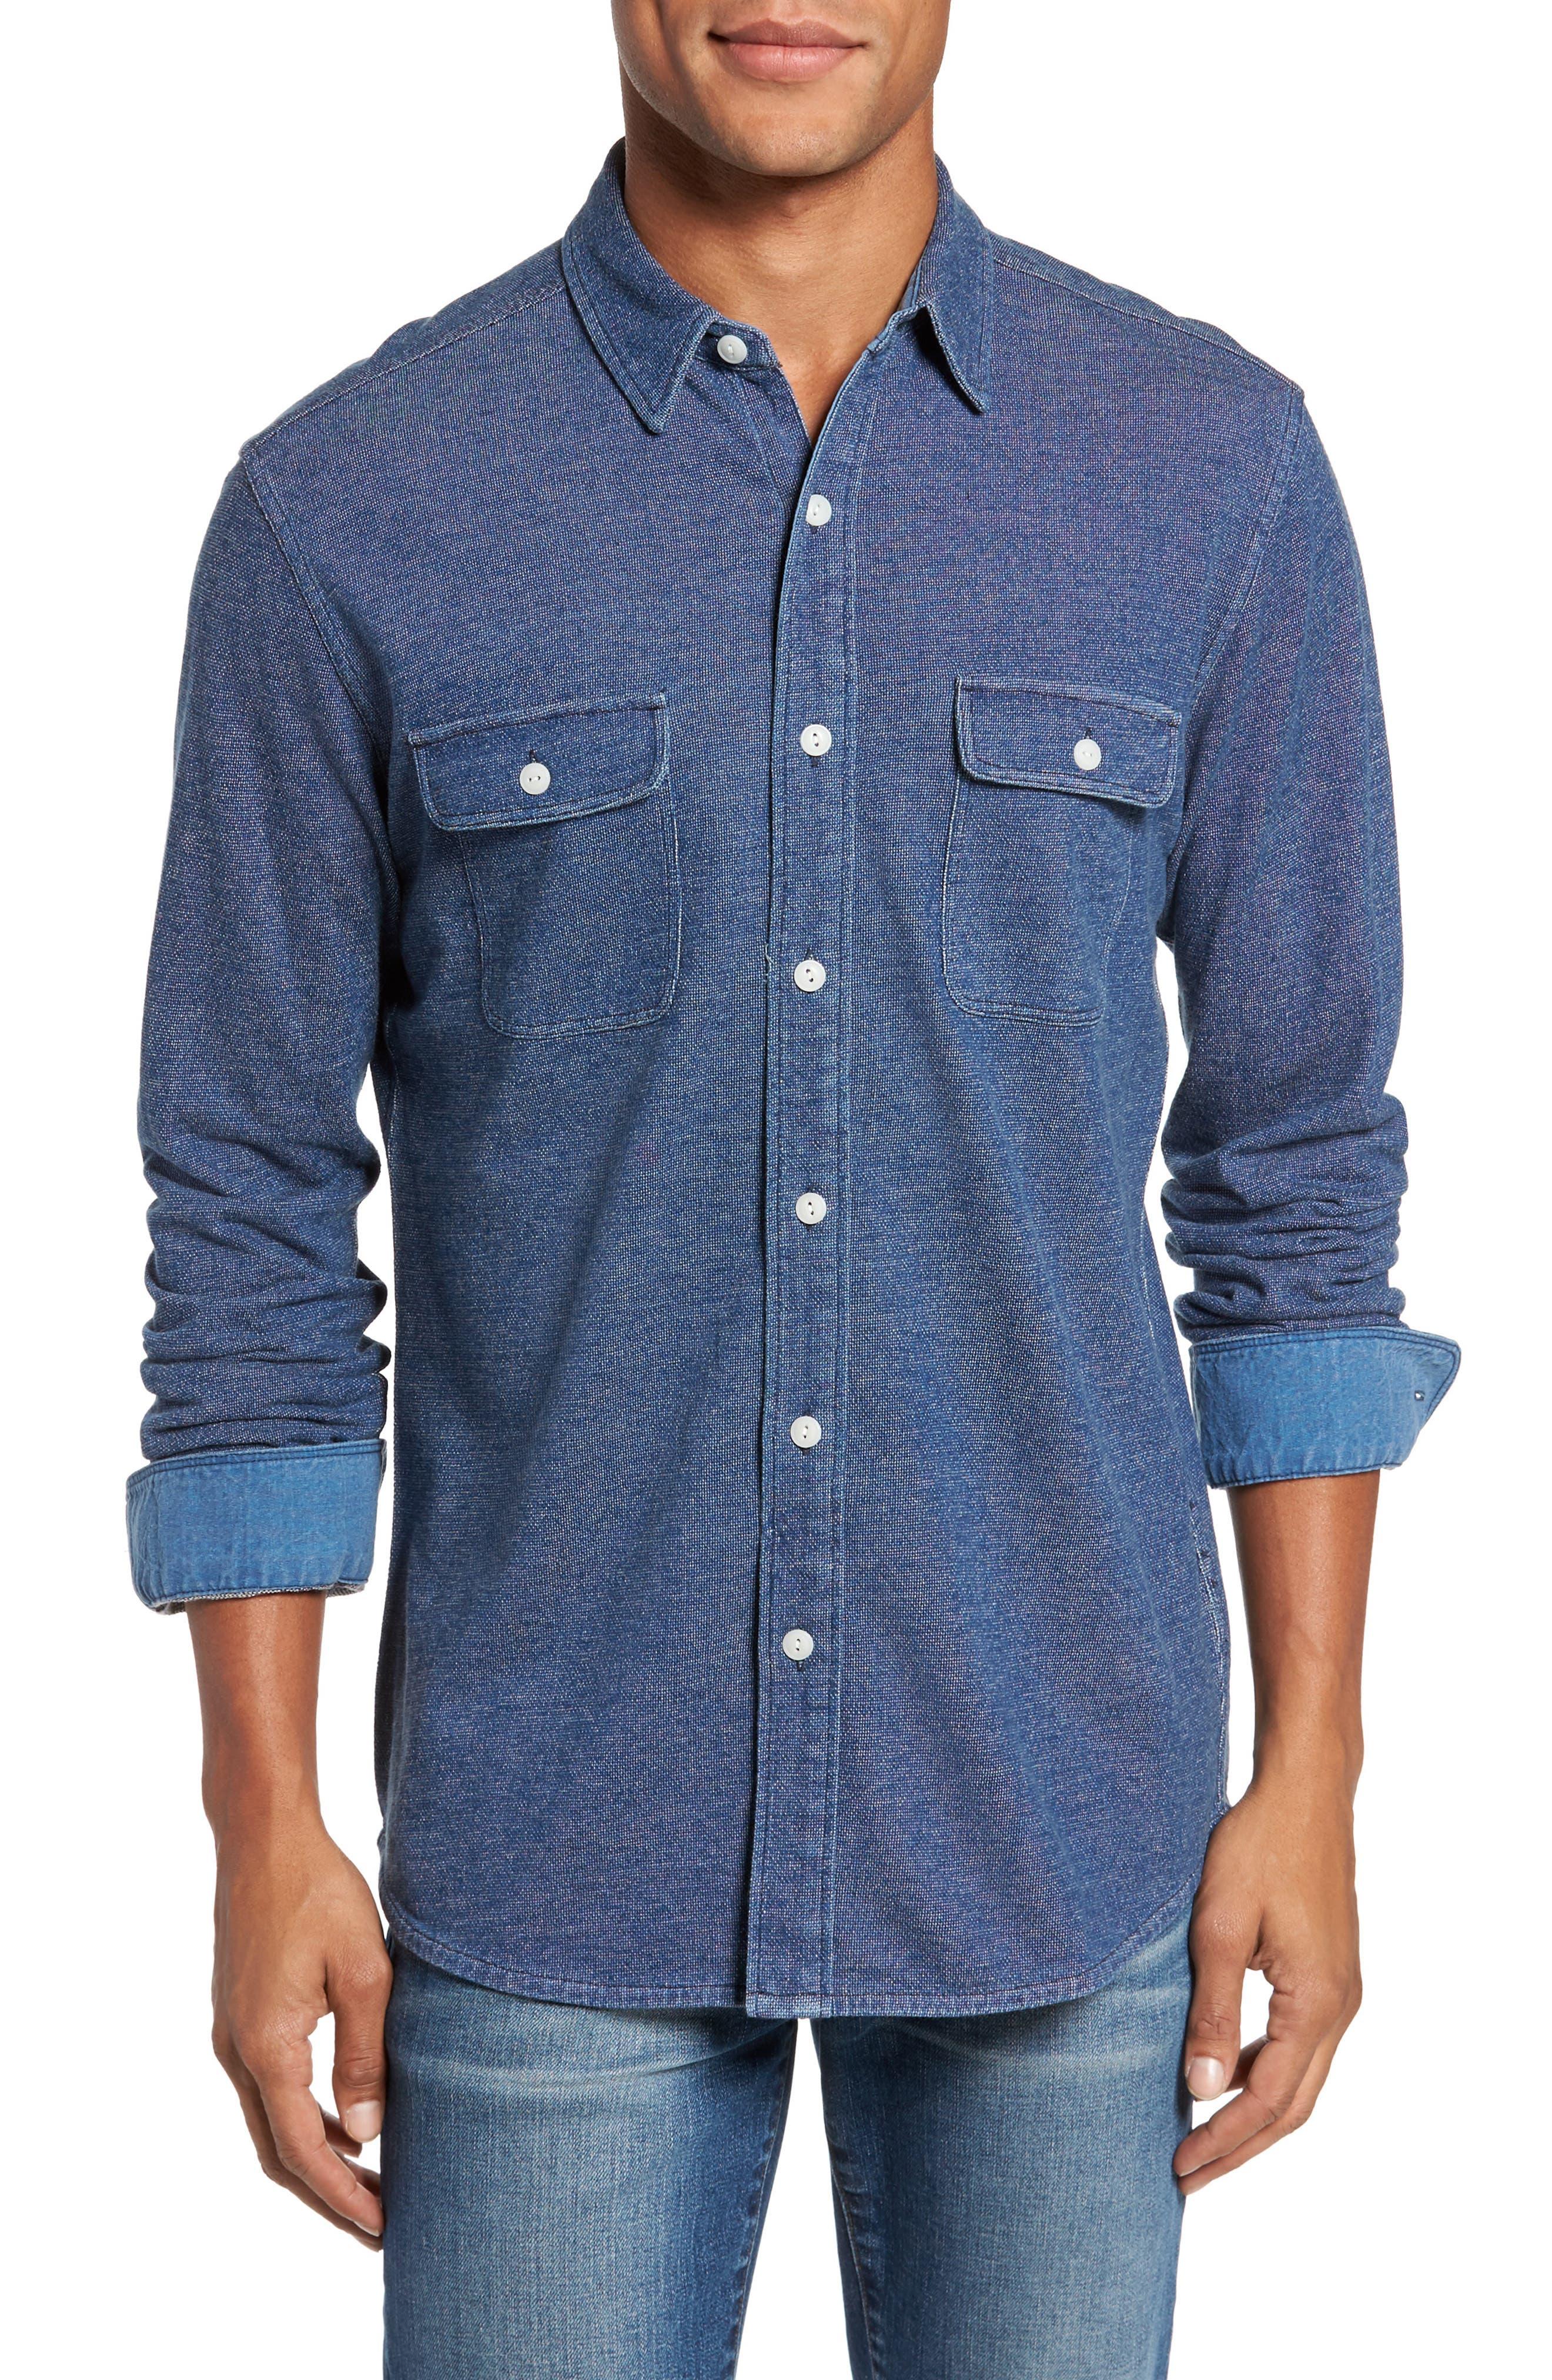 Belmar Knit Sport Shirt,                             Main thumbnail 1, color,                             404